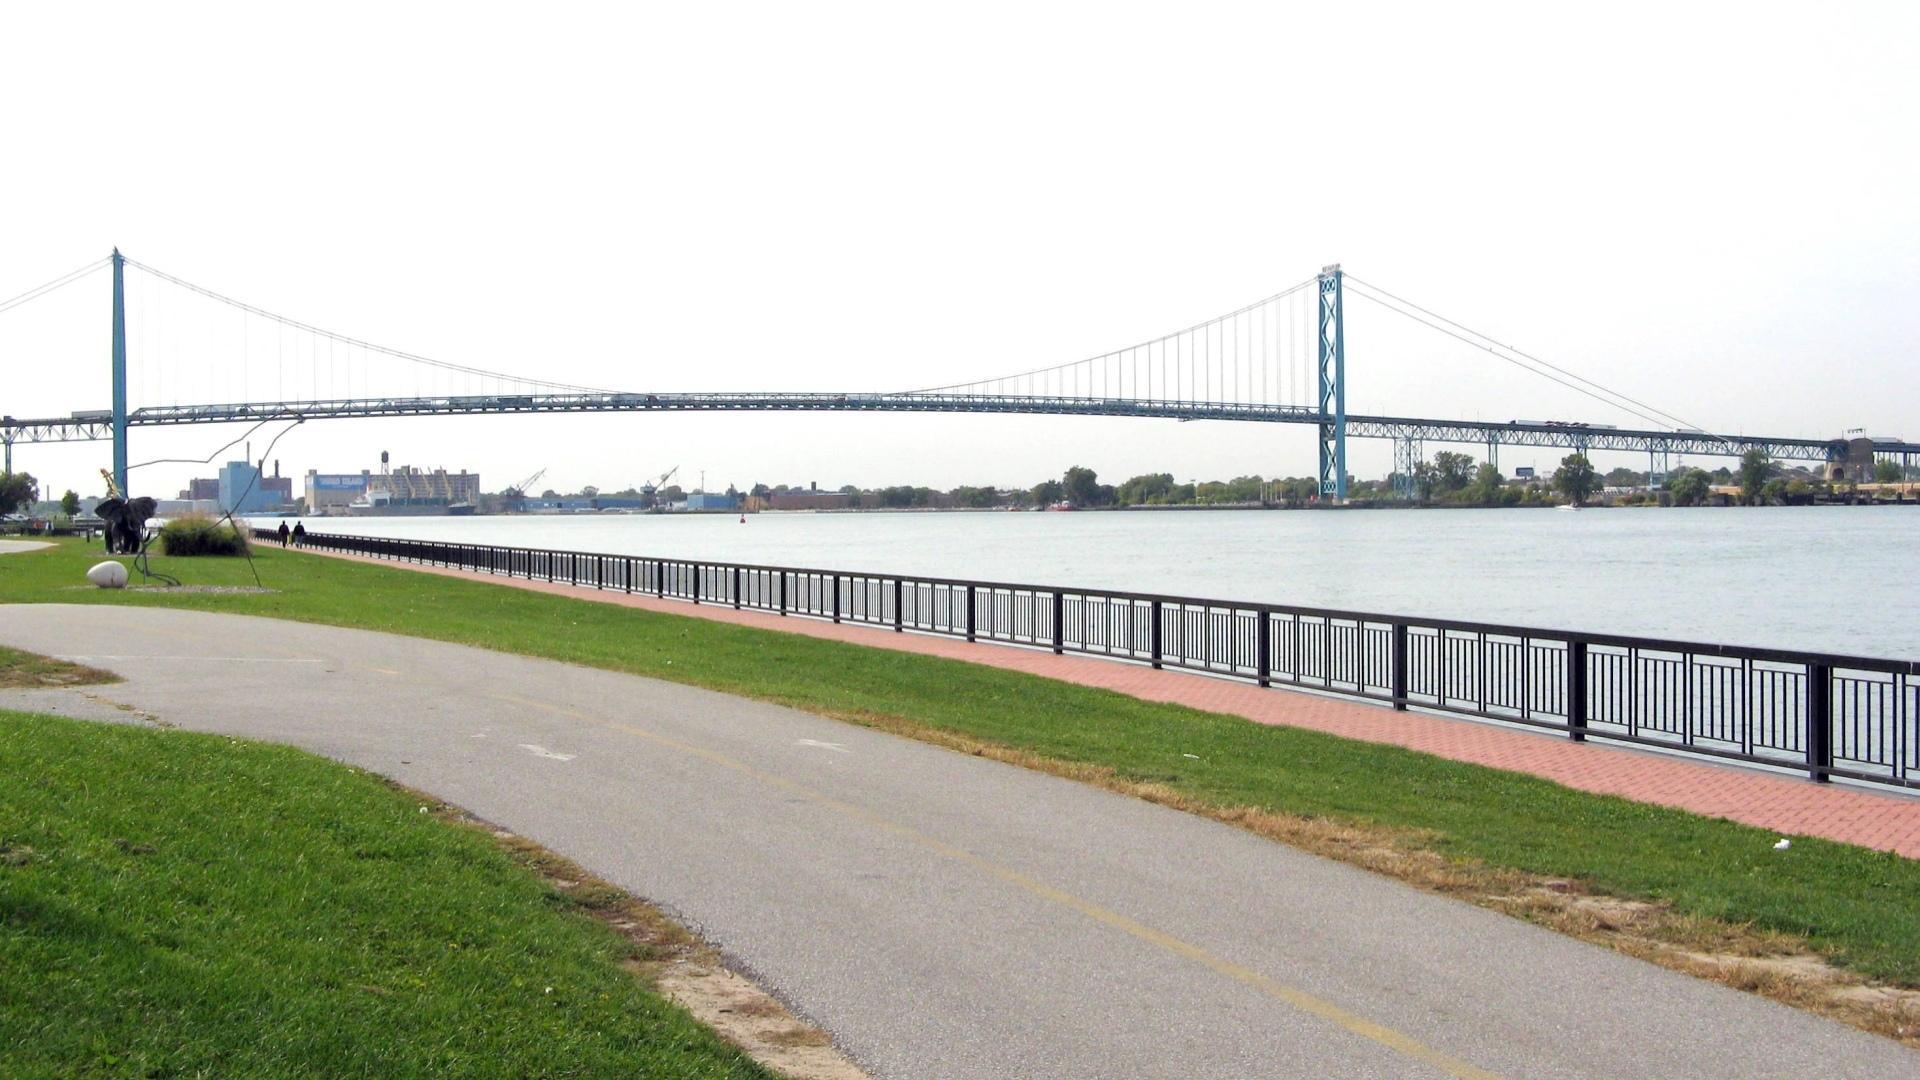 Ambassador Bridge wallpapers HD quality